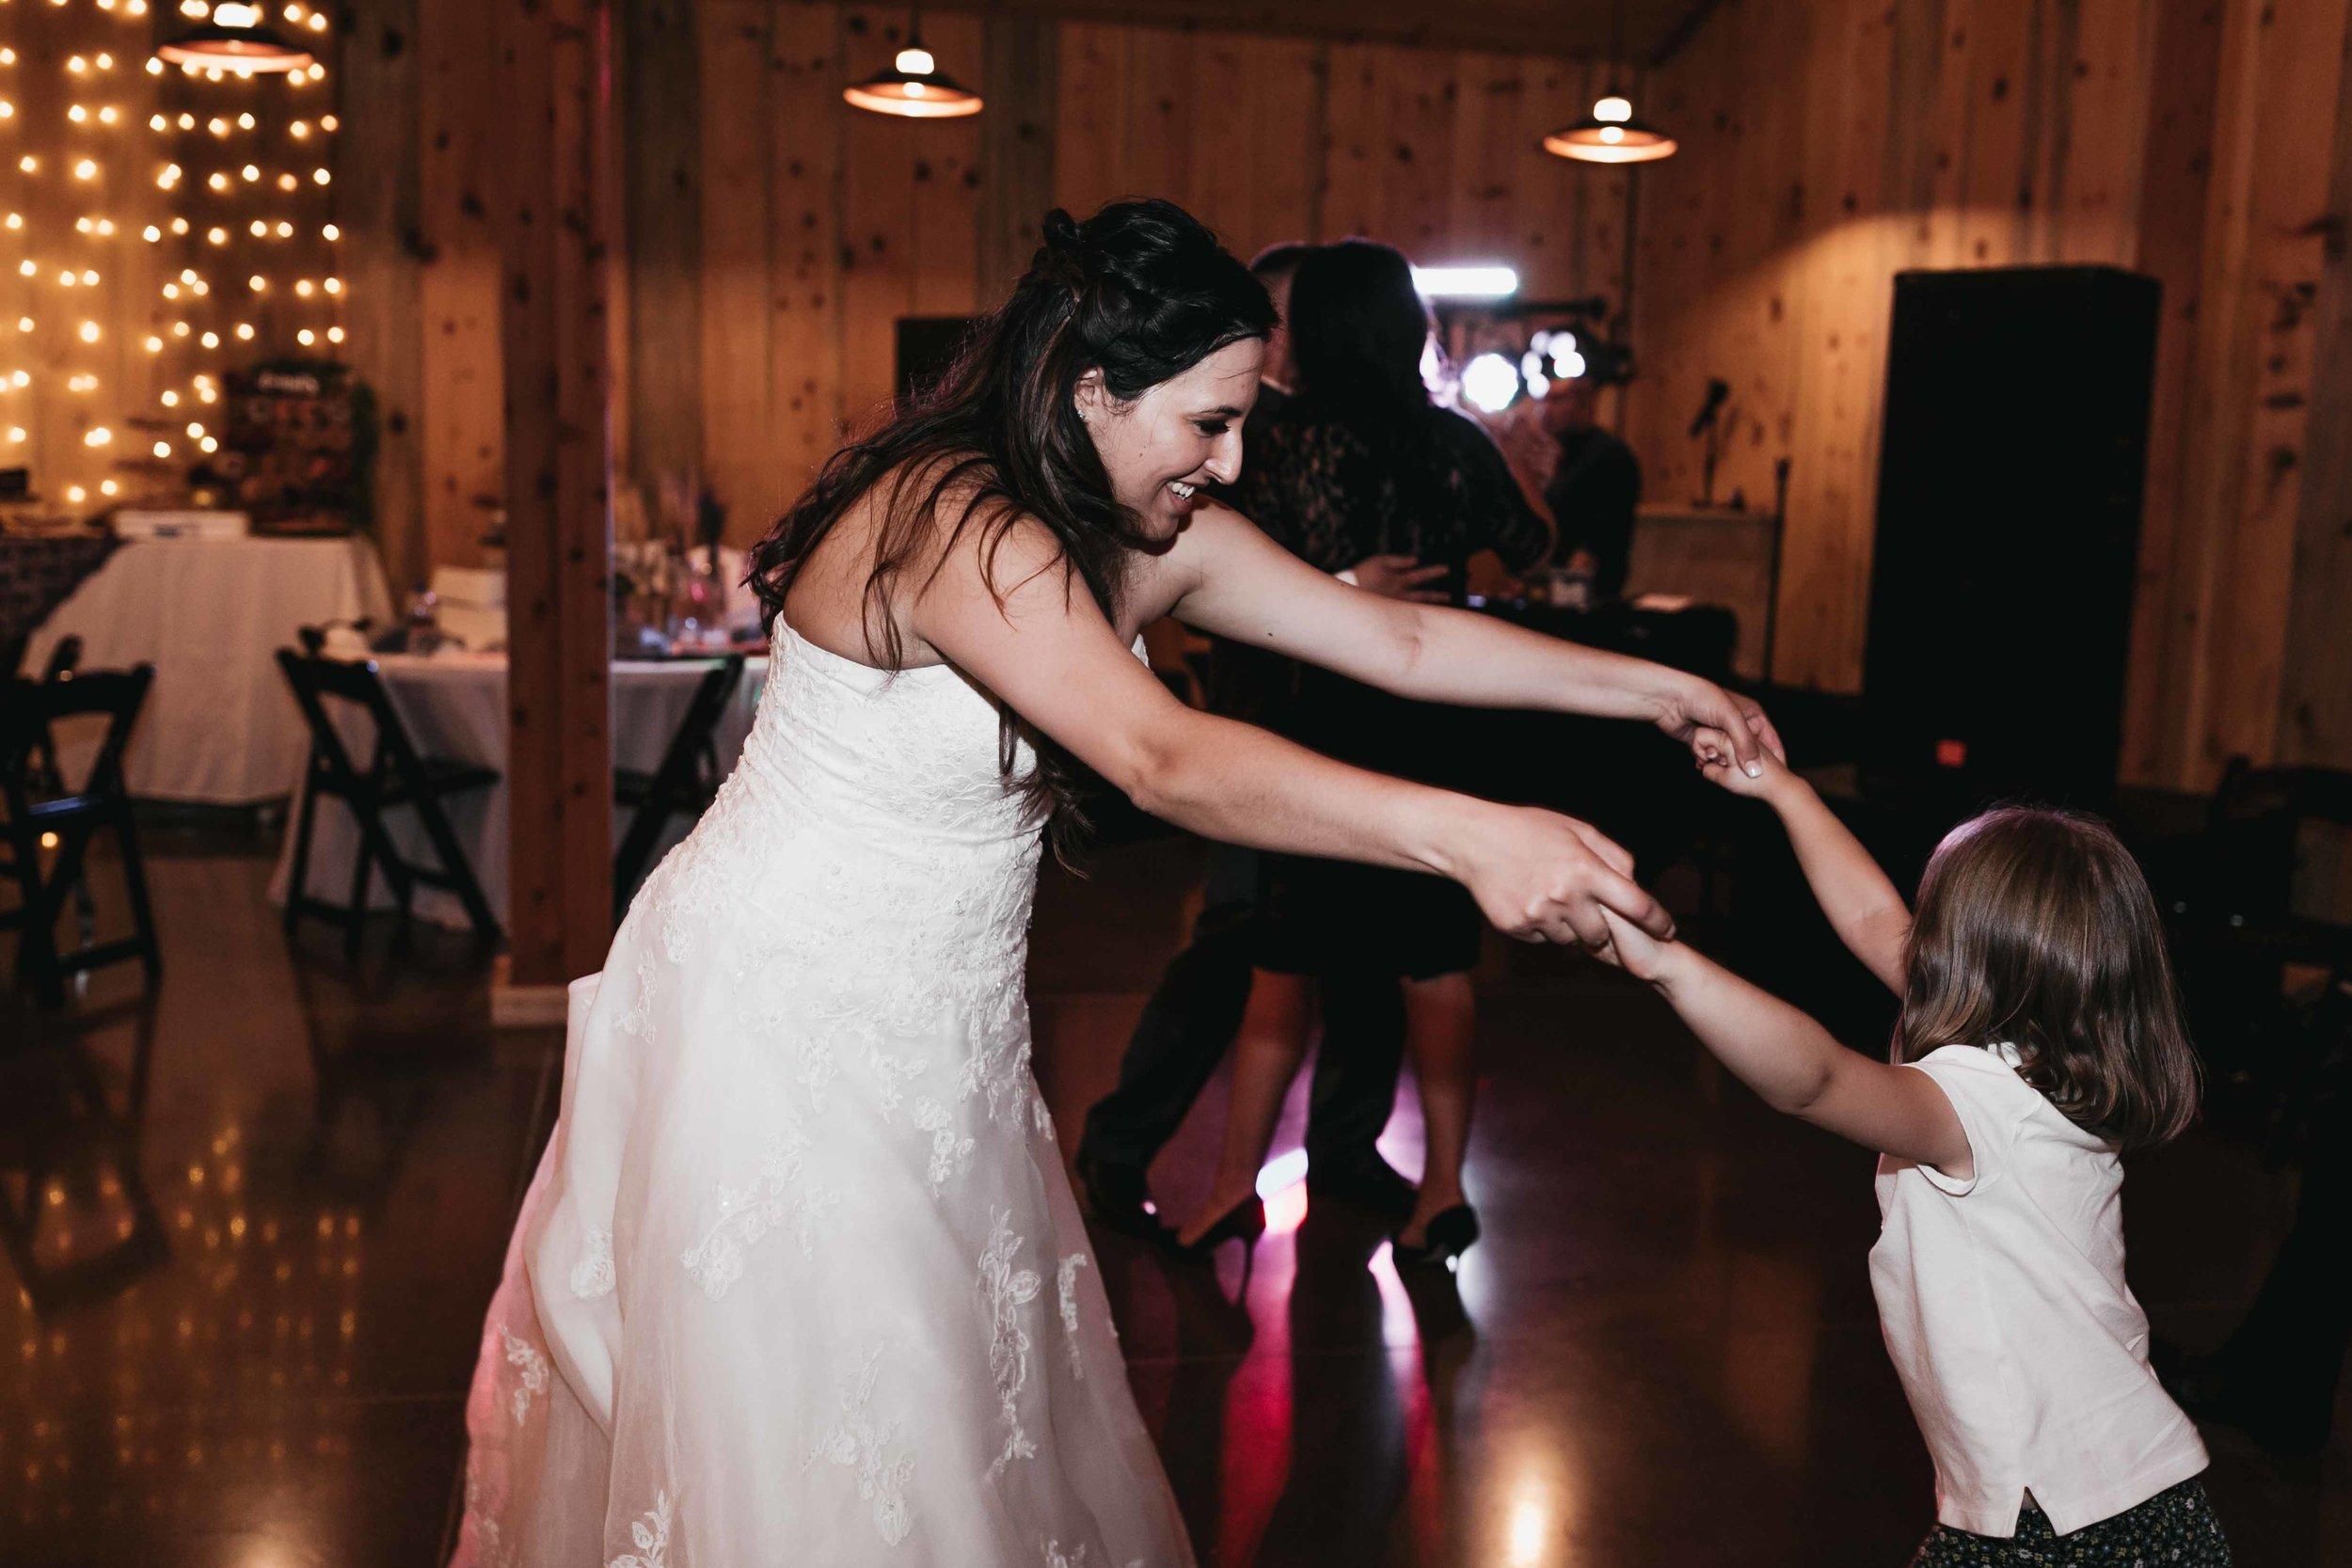 tuncannon-cellars-wedding-135.jpg